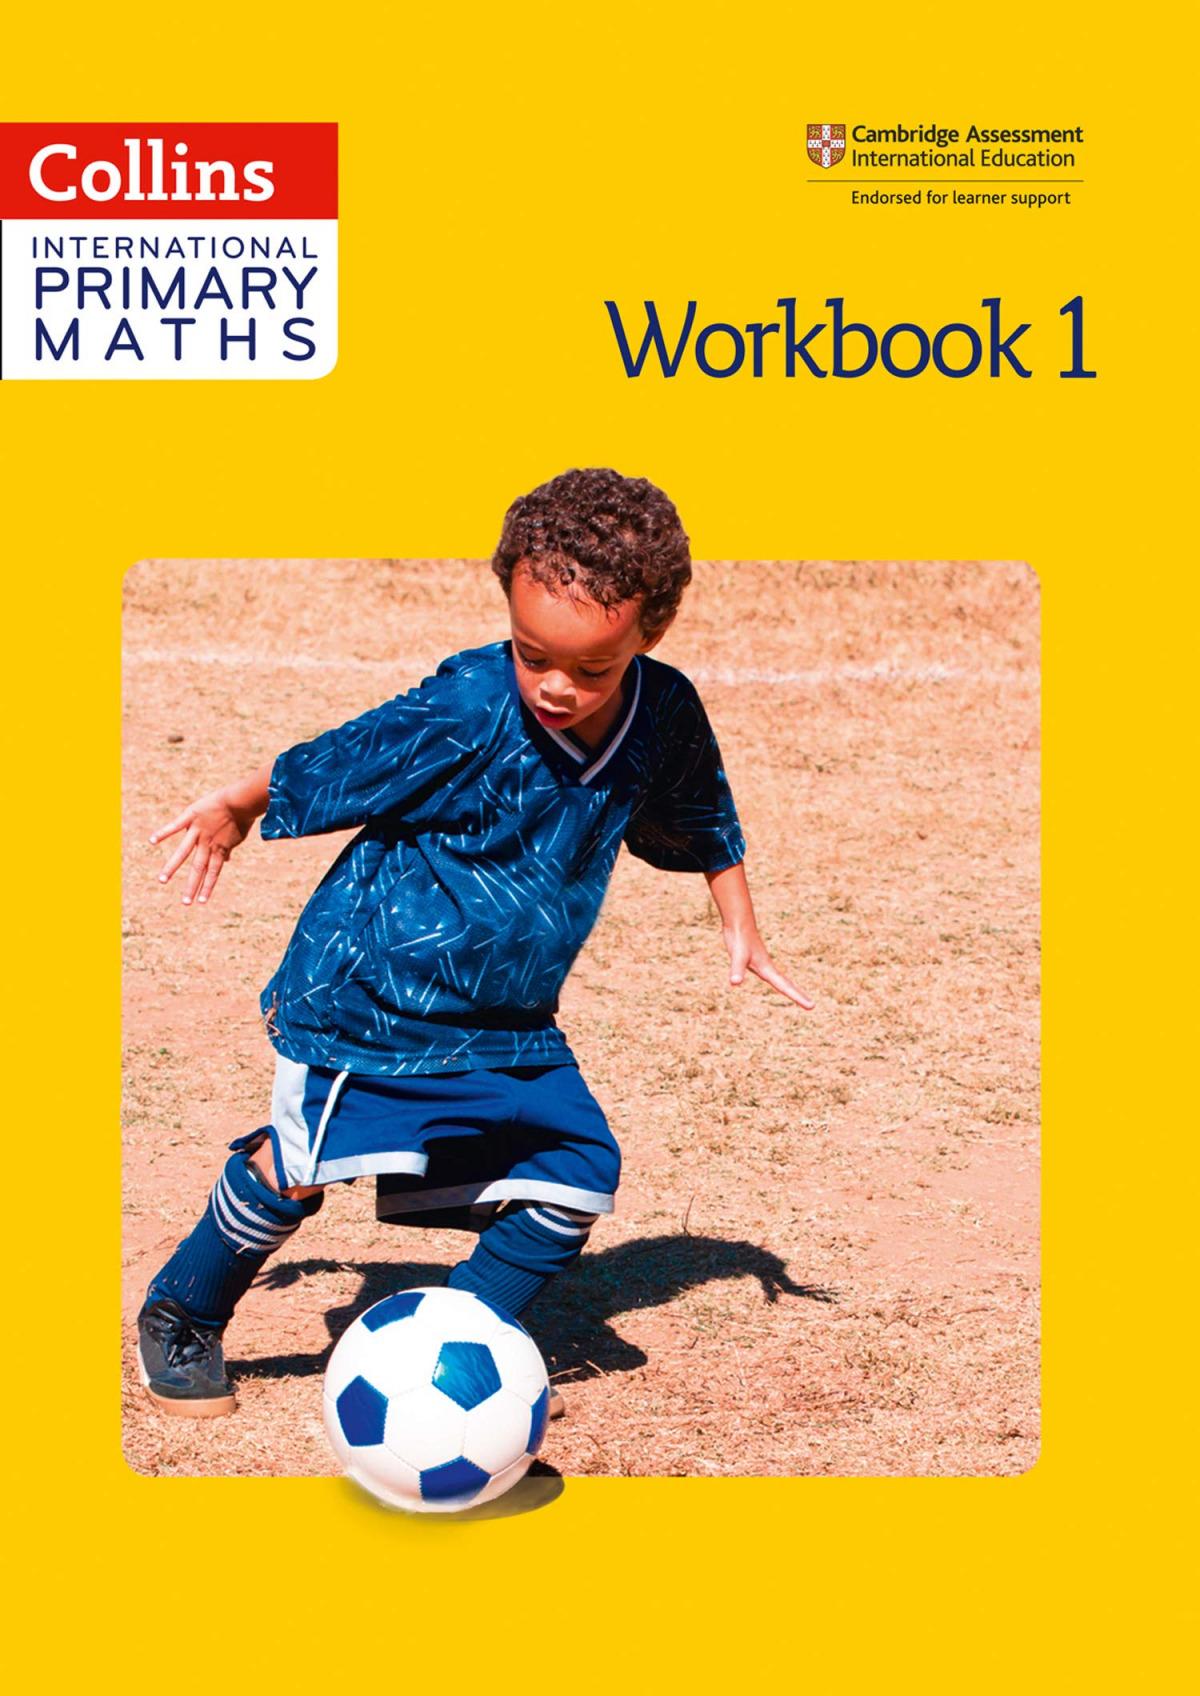 Collins international primary maths